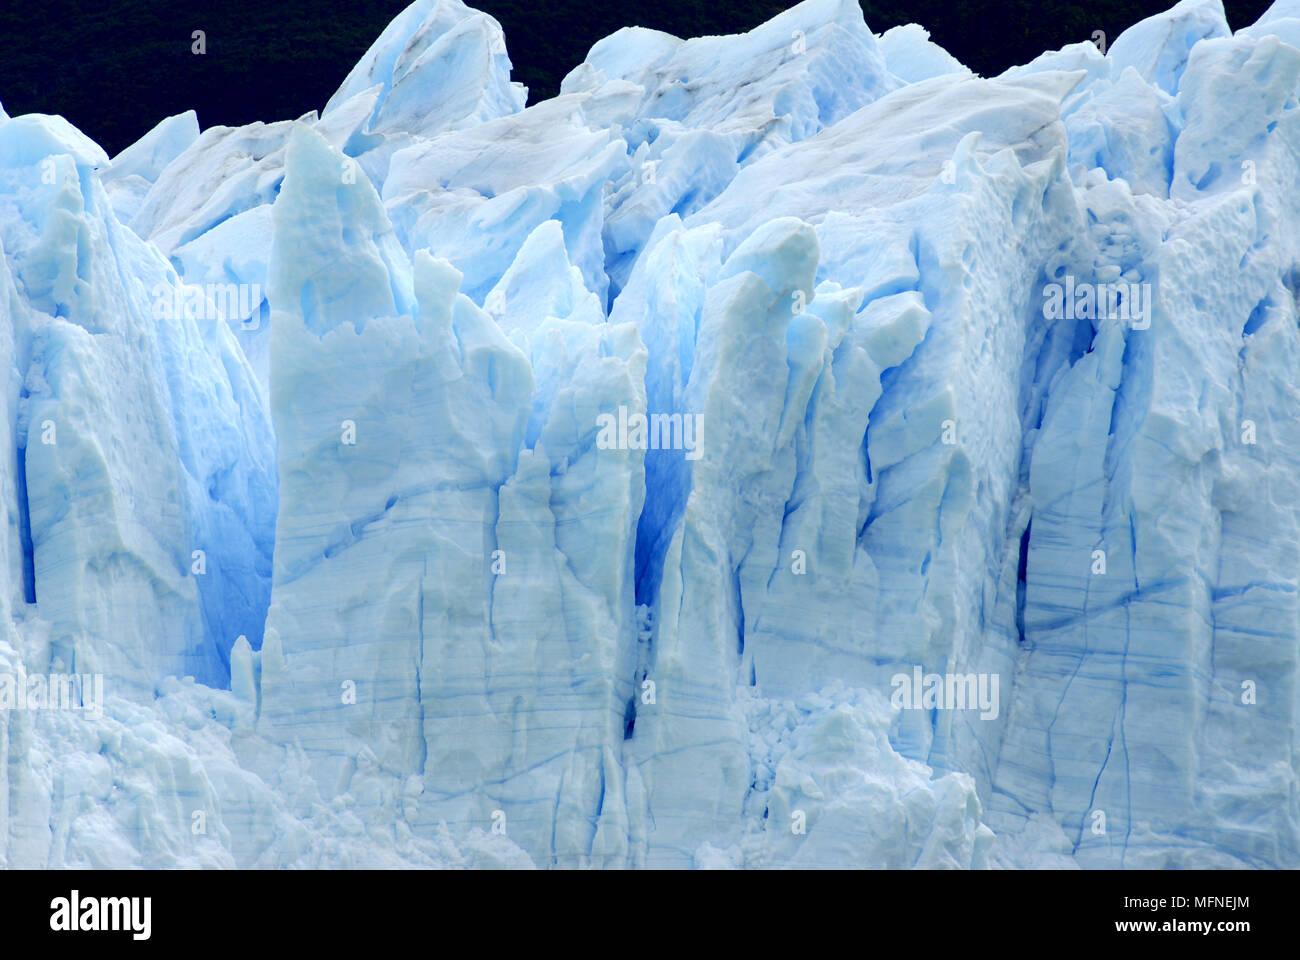 Close-up of an iceberg   Ref: CRB247_10007_032  Compulsory Credit: Jeremy Hoare/Photoshot - Stock Image